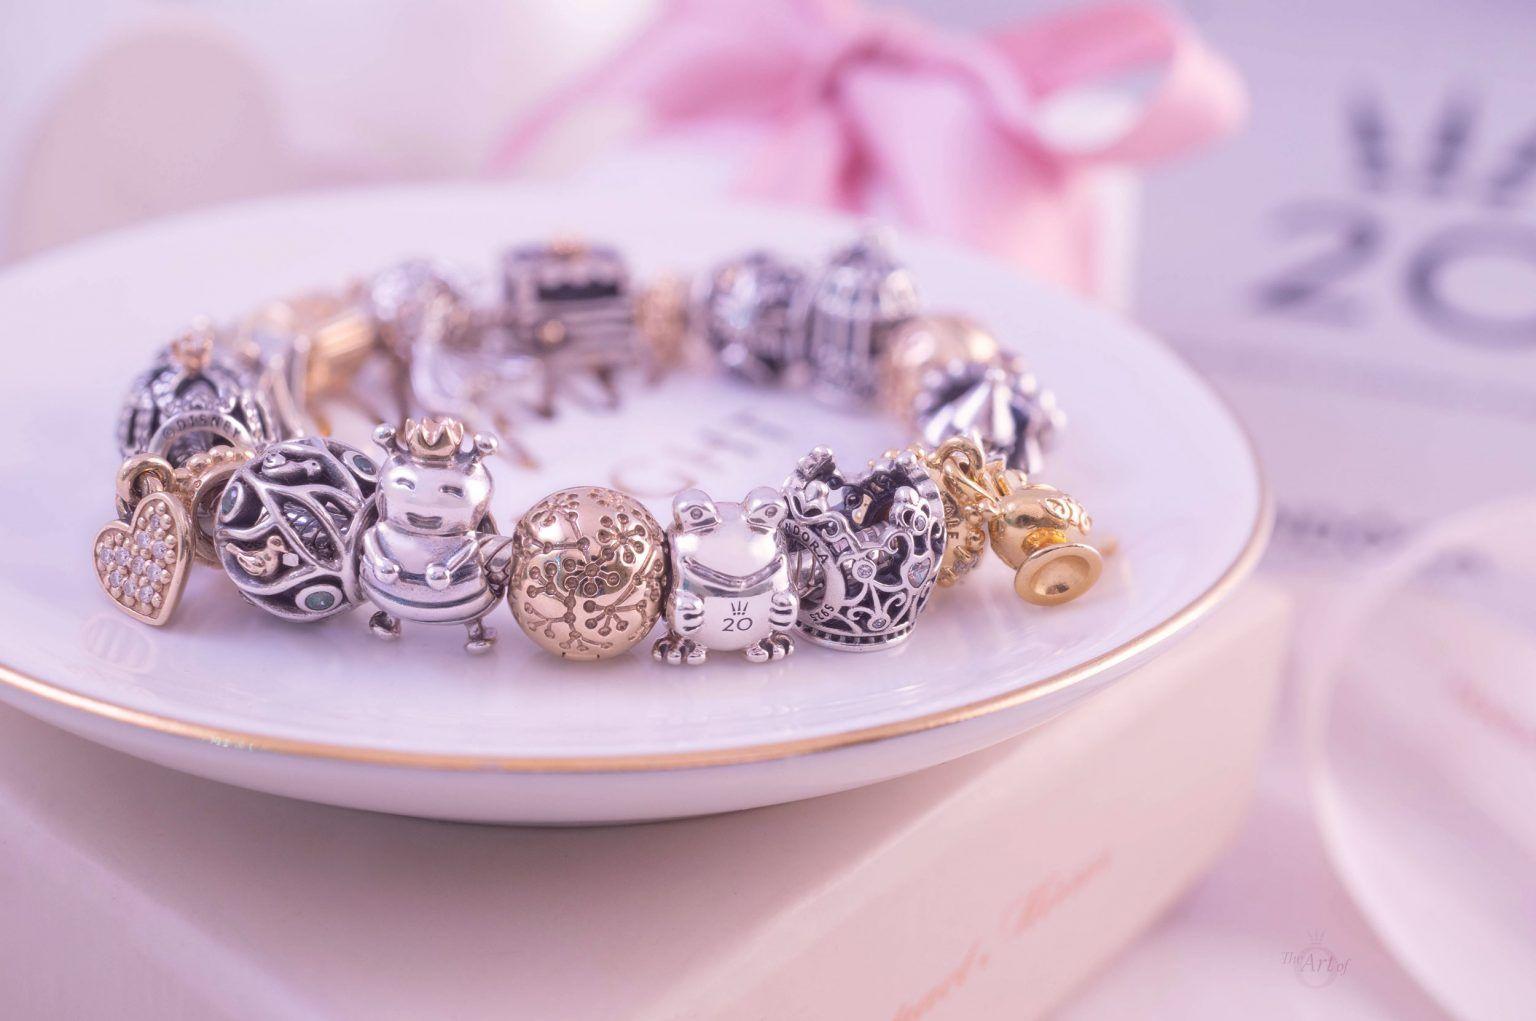 Pin on Pandora bracelet